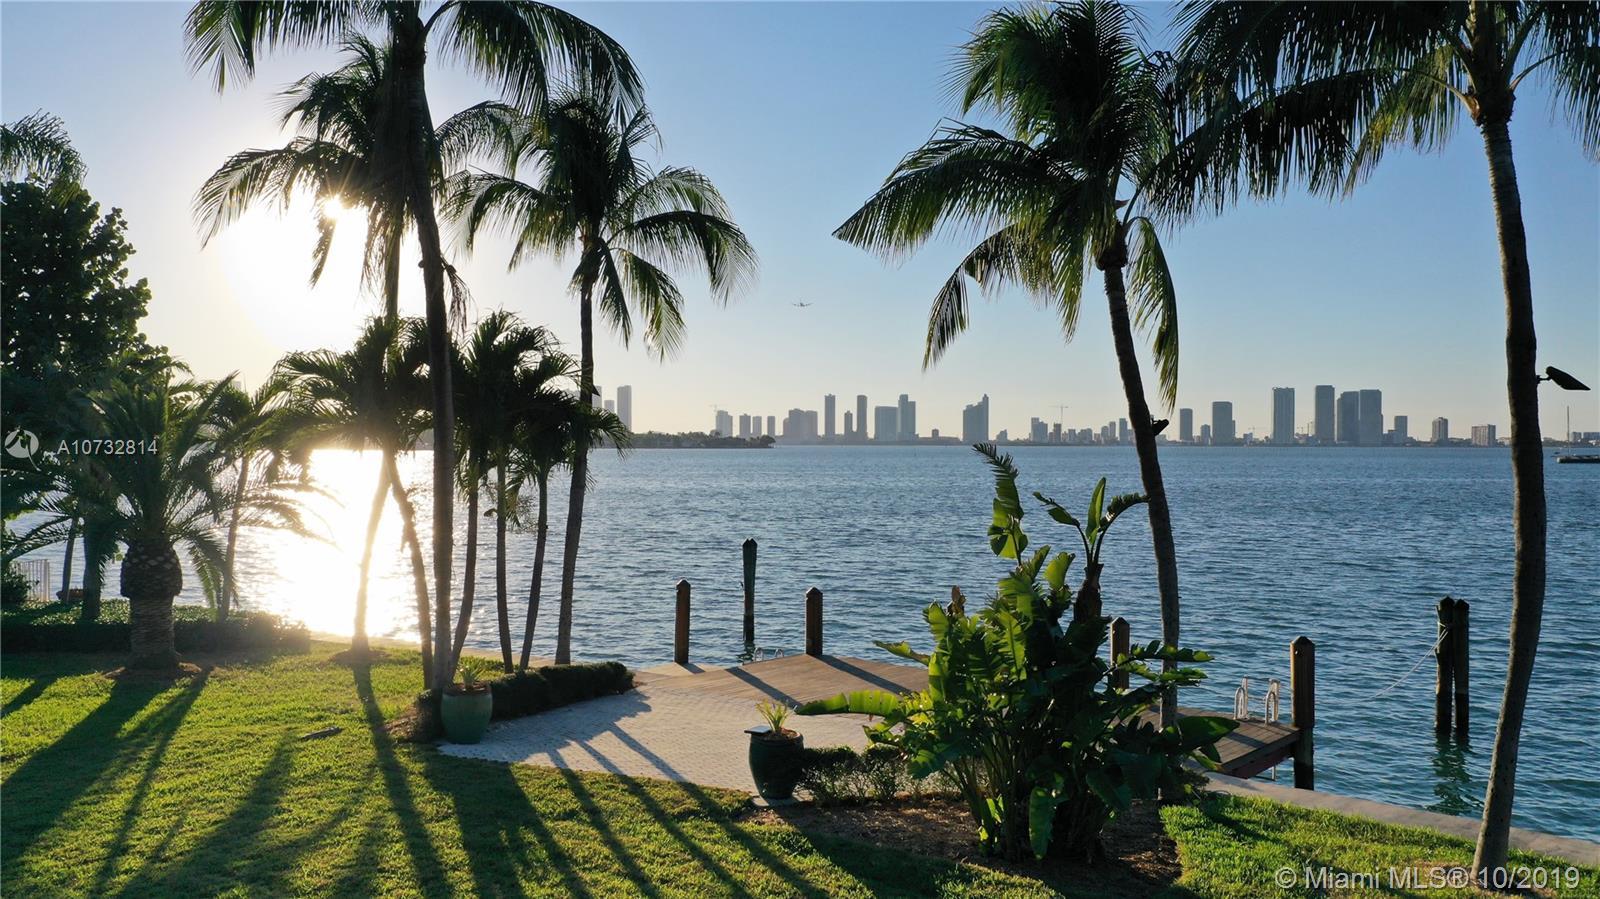 2142 Bay Ave, Miami Beach FL 33140